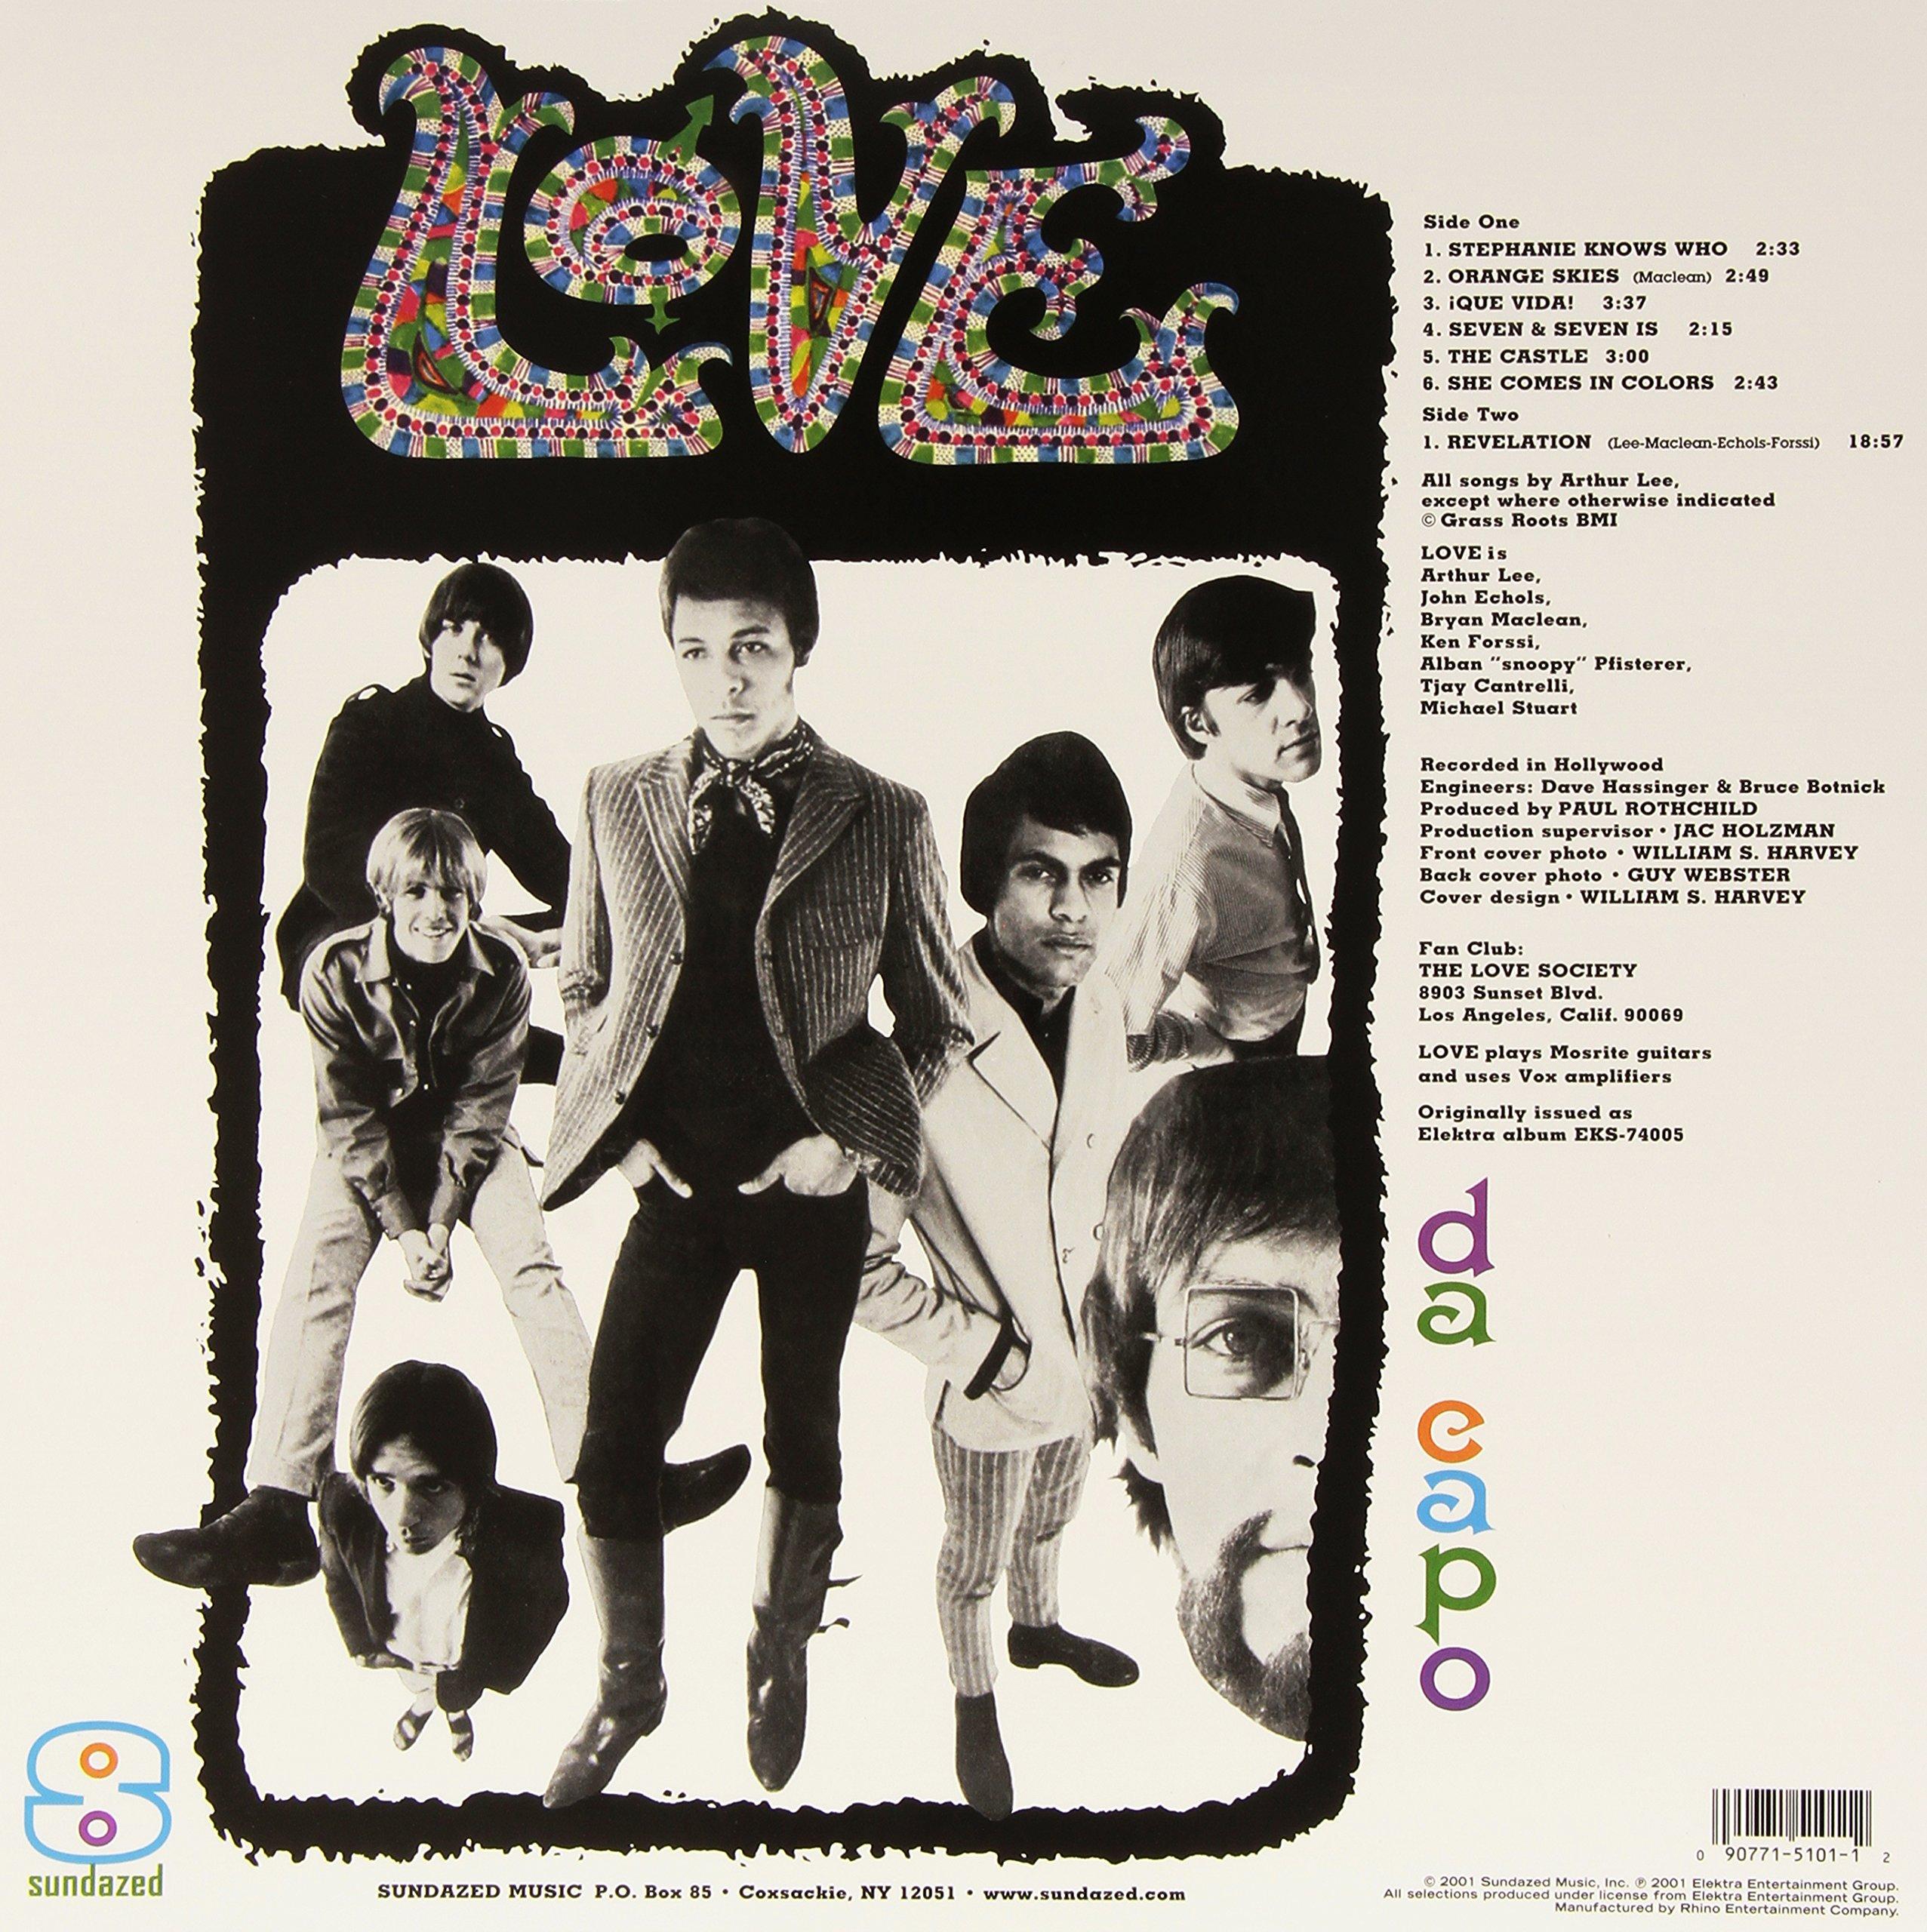 Da Capo [Vinyl] by Love